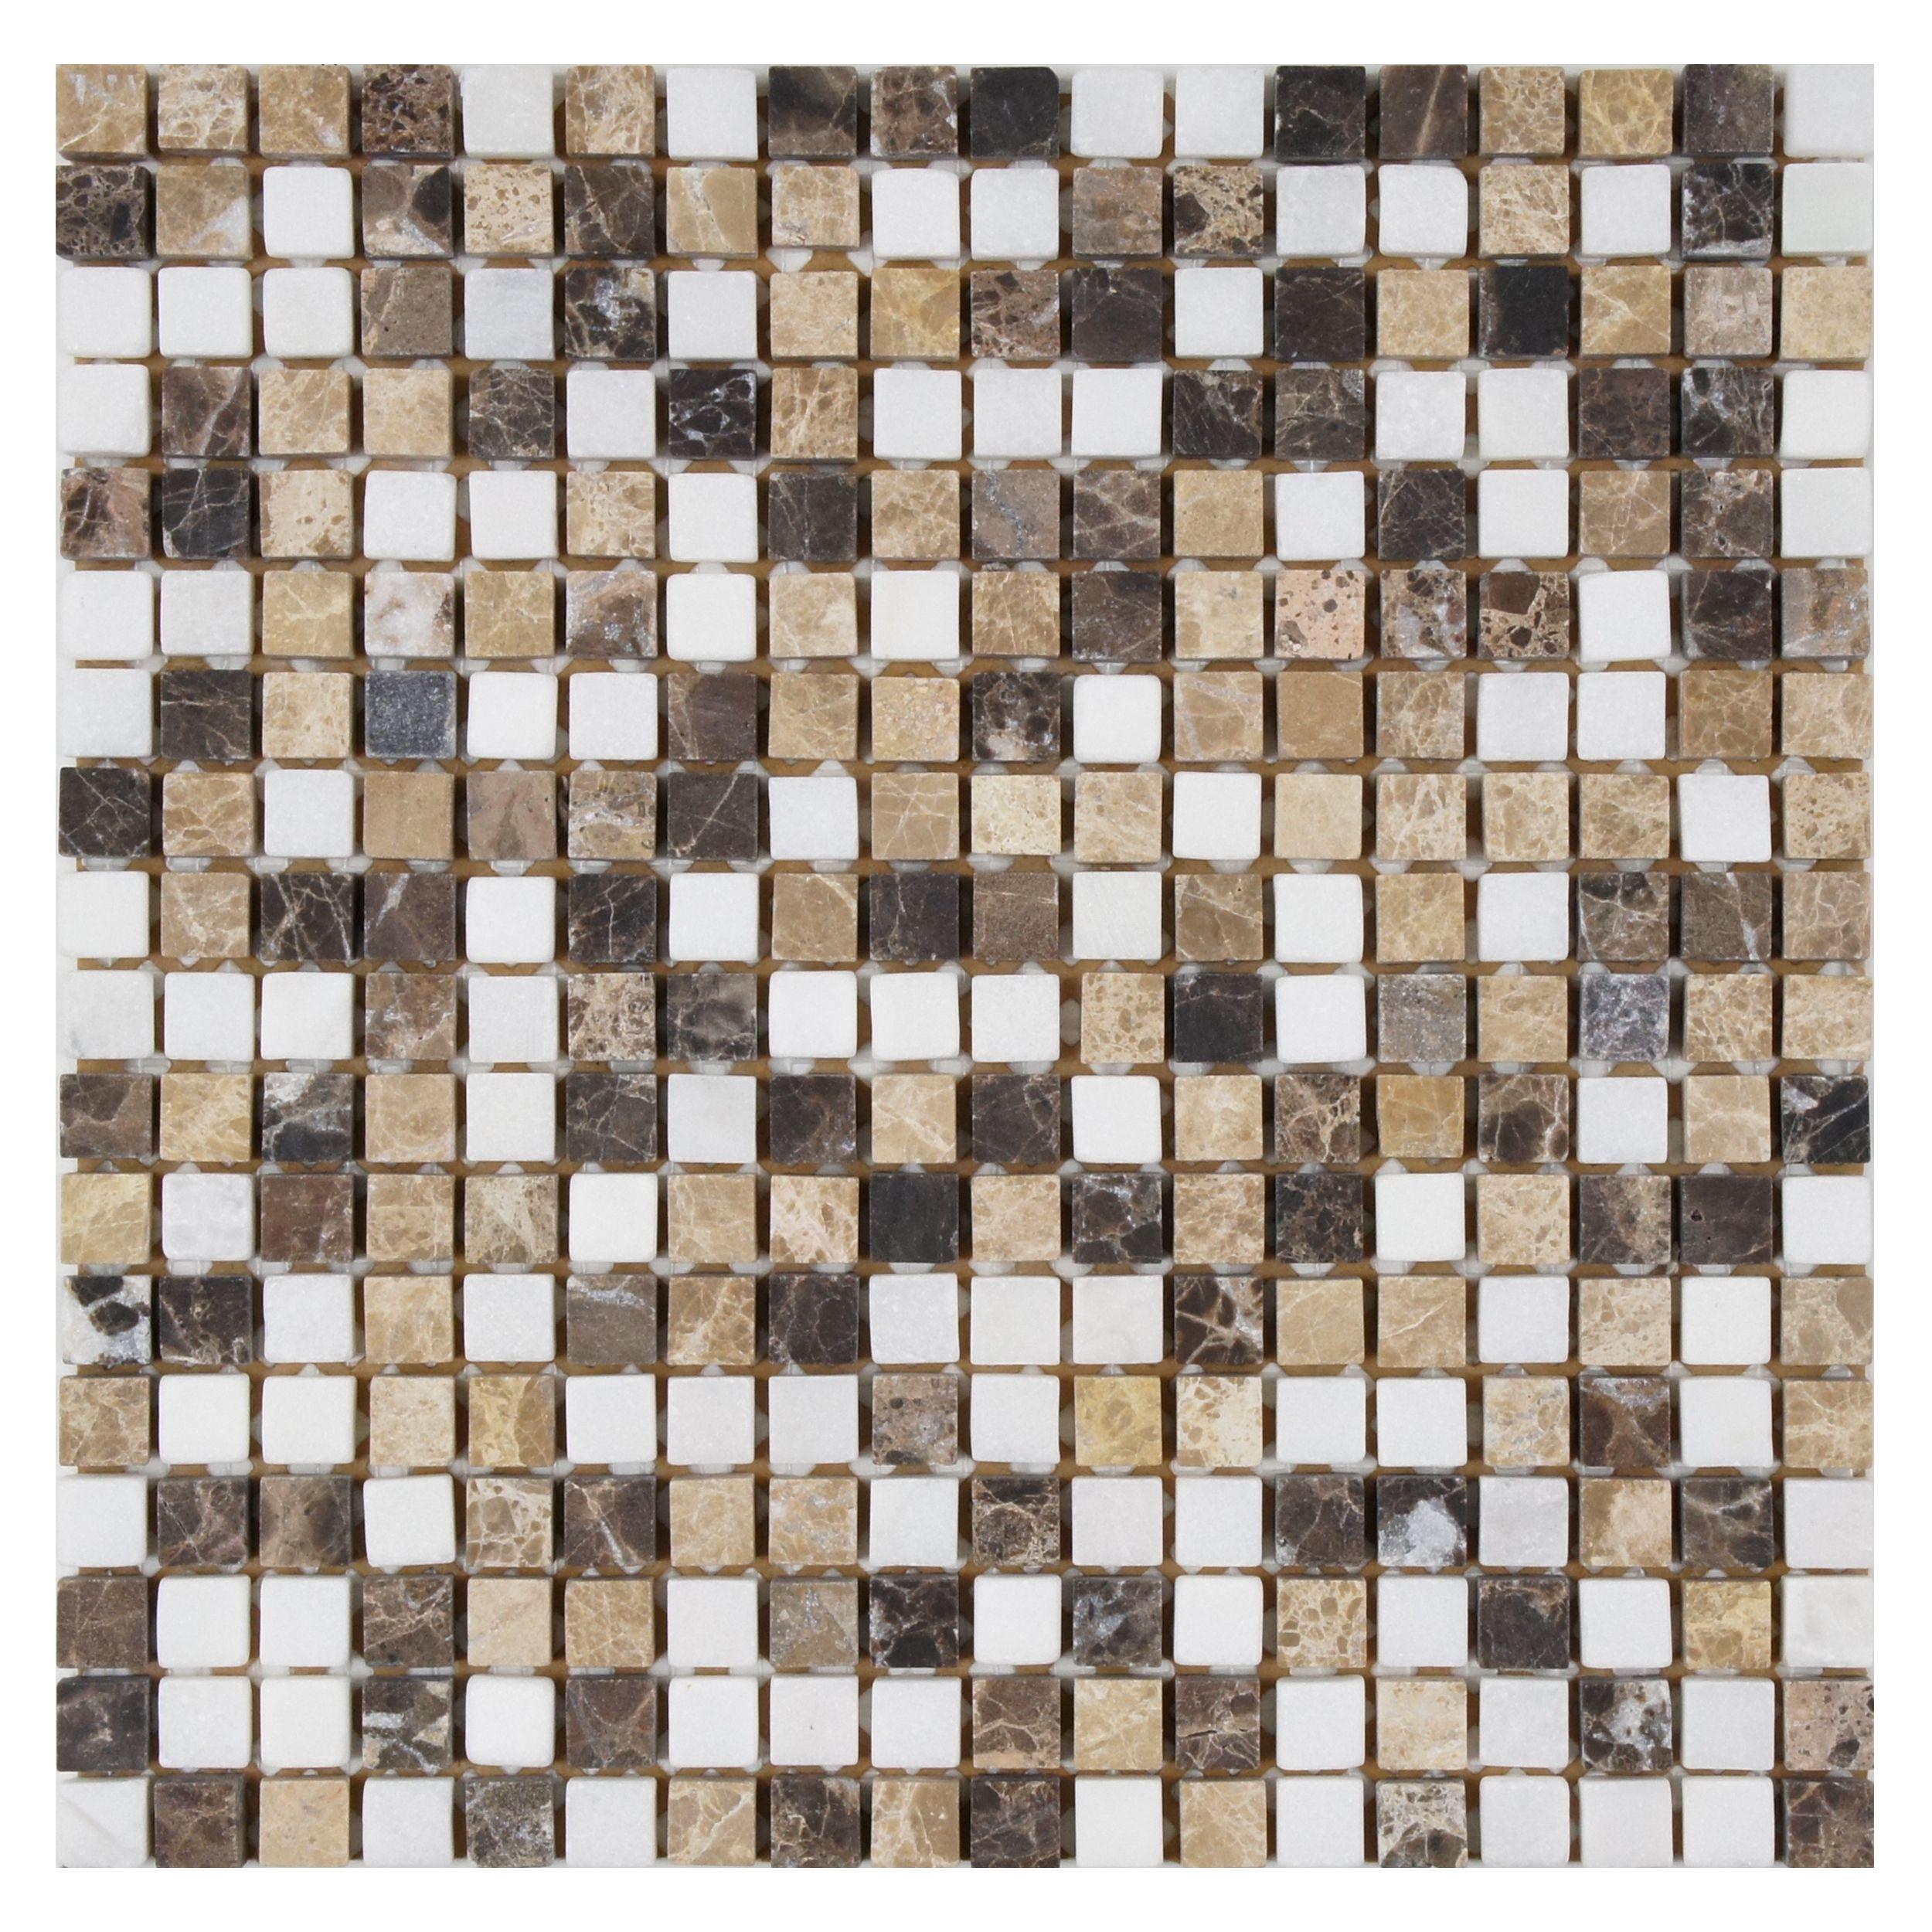 SomerTile 12x12-inch Boccaccio Mini Sand Mosaic Wall Tile